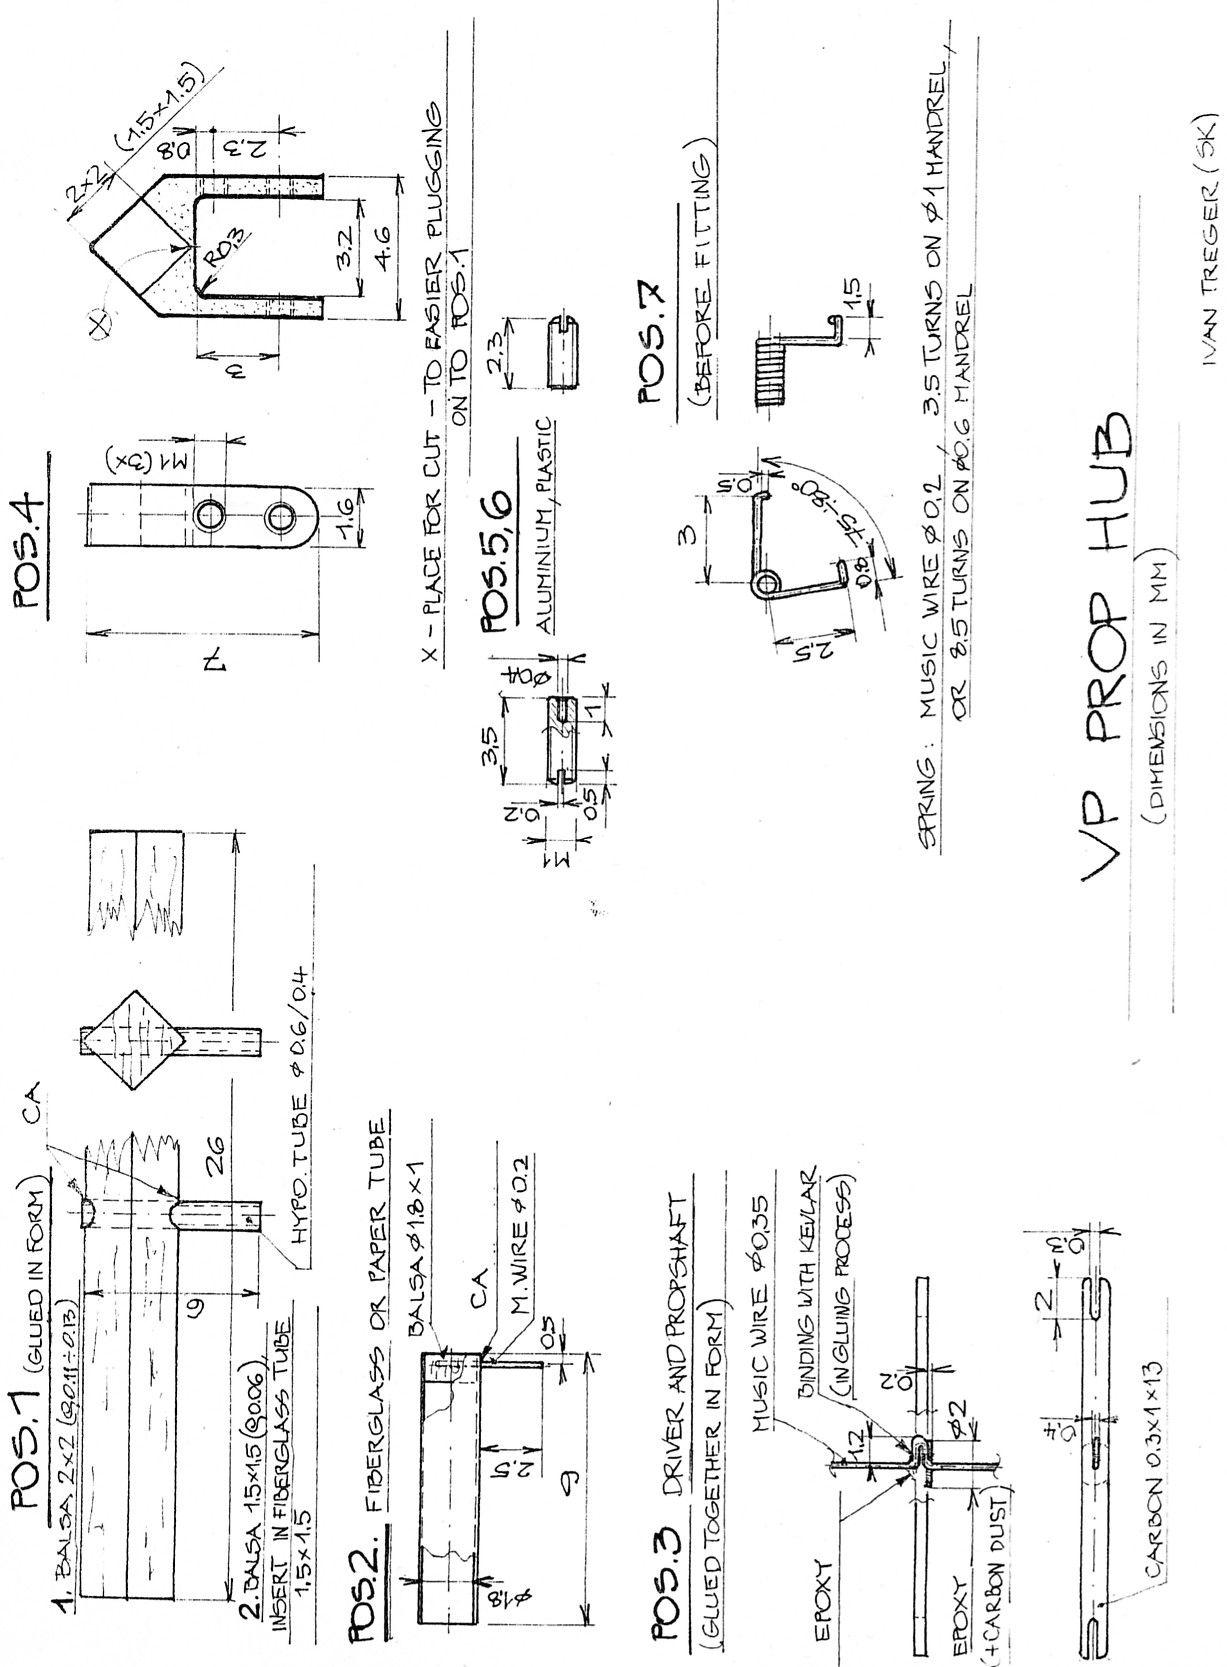 Plan of Ivan Treger's 0.6 gram rubber F1D Variable Pitch